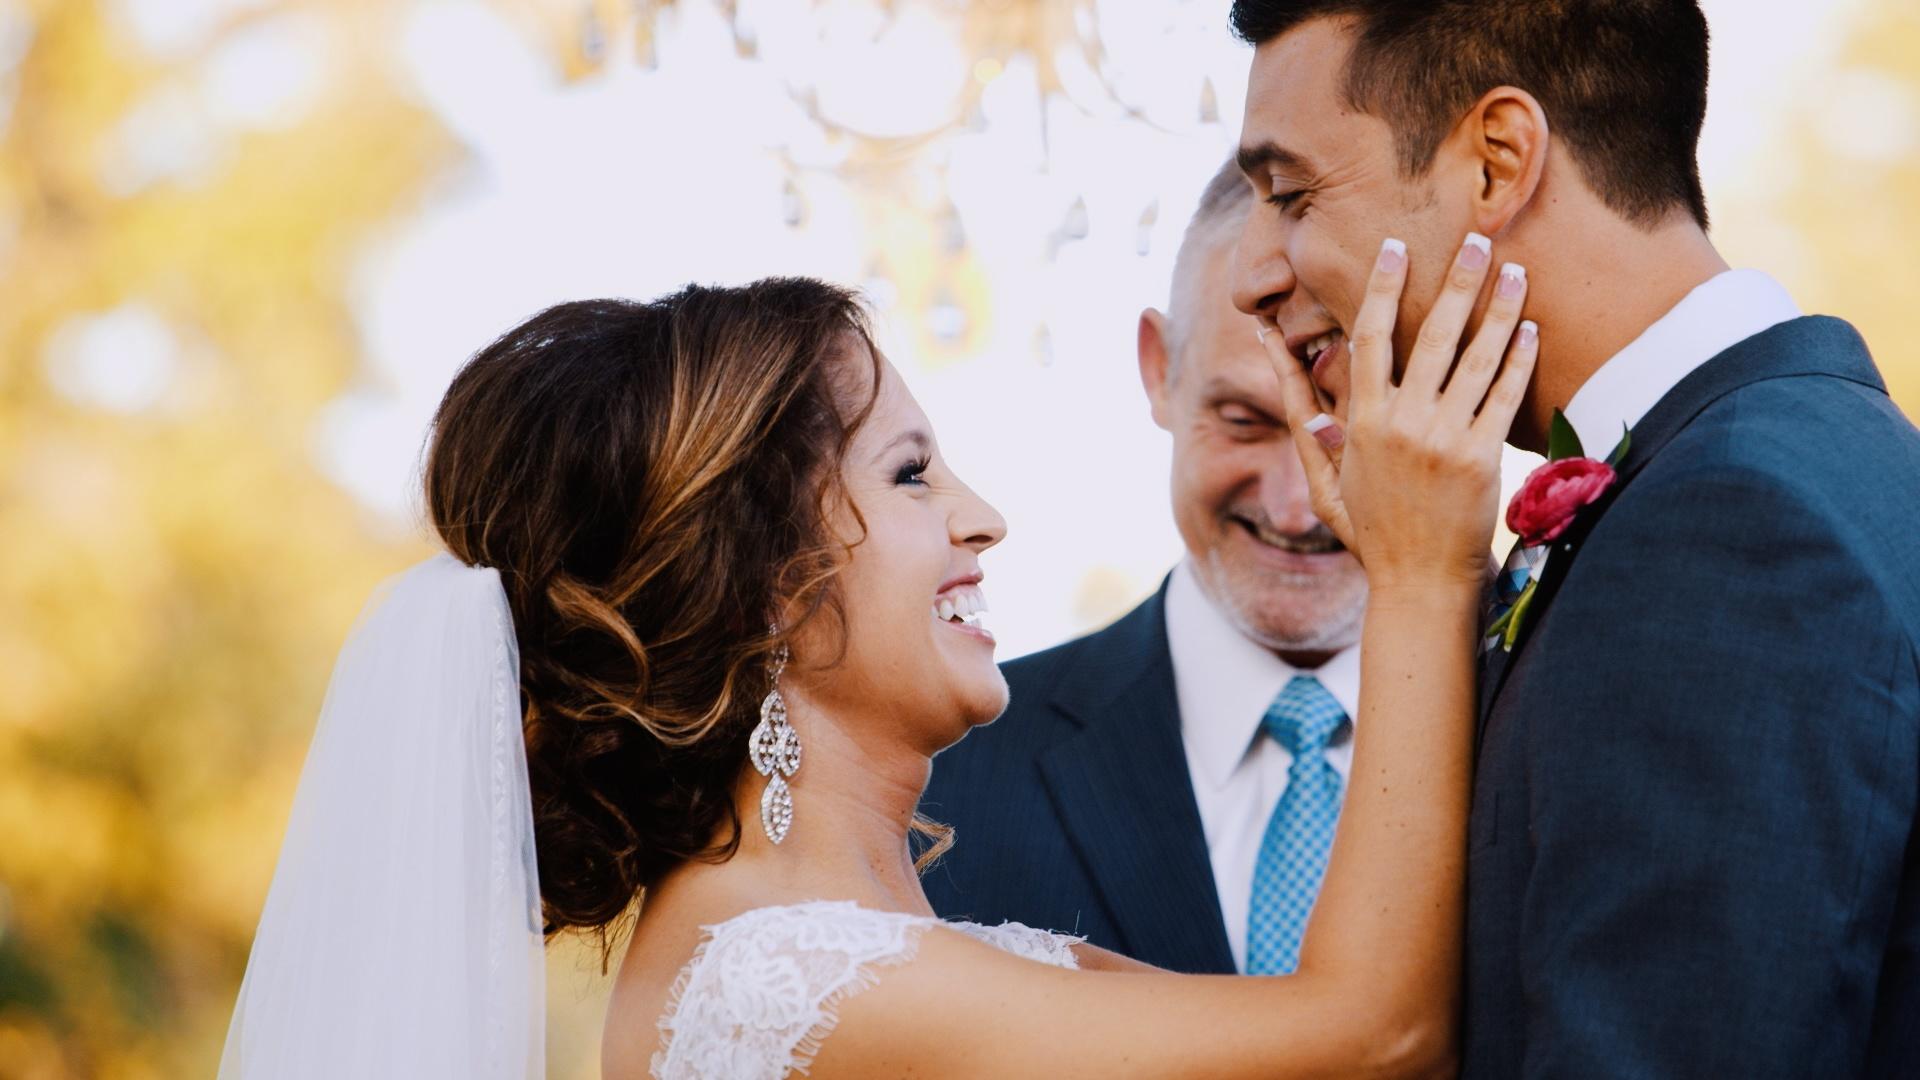 Wedding Videographer Napa, CA